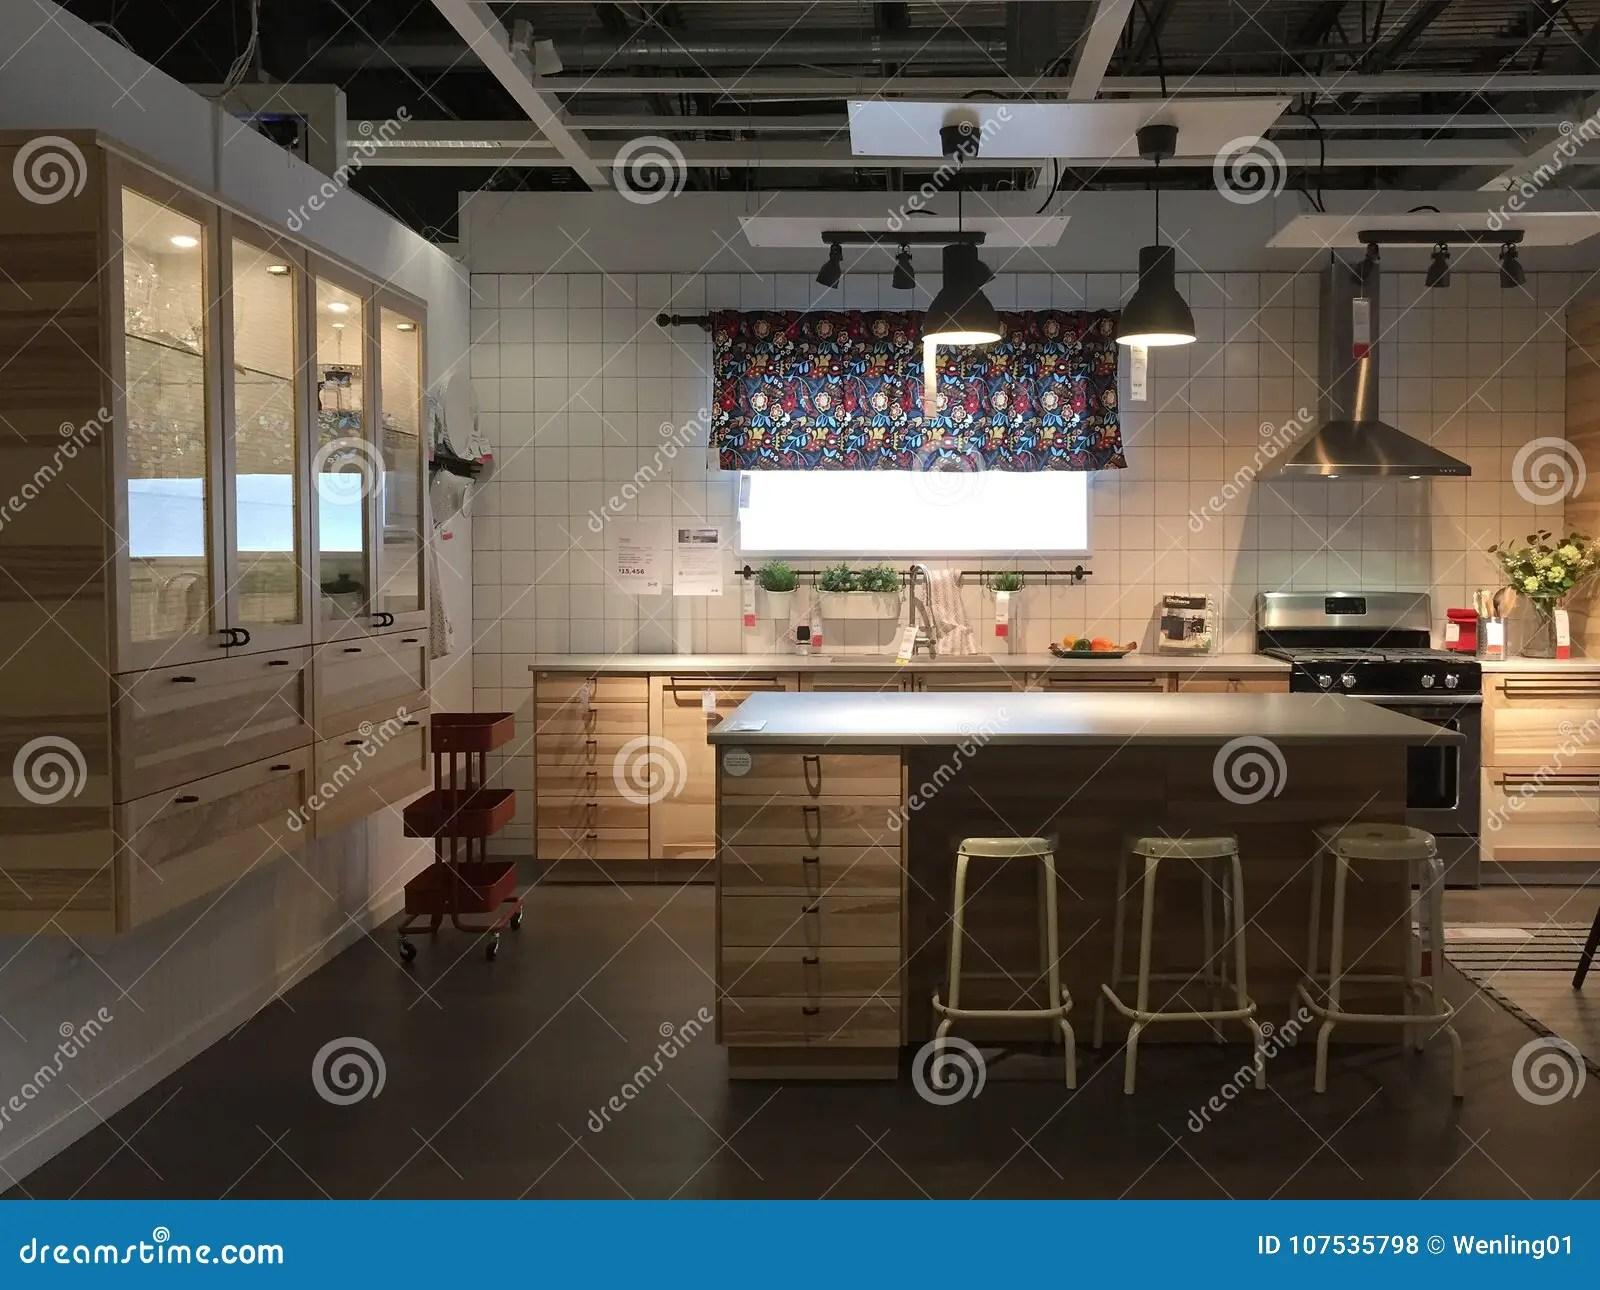 home and kitchen stores outdoor design software 与海岛的现代厨房设计宜家的美国编辑类库存照片 图片包括有壁橱 出售 精密现代厨房家具在商店宜家 tx美国的待售